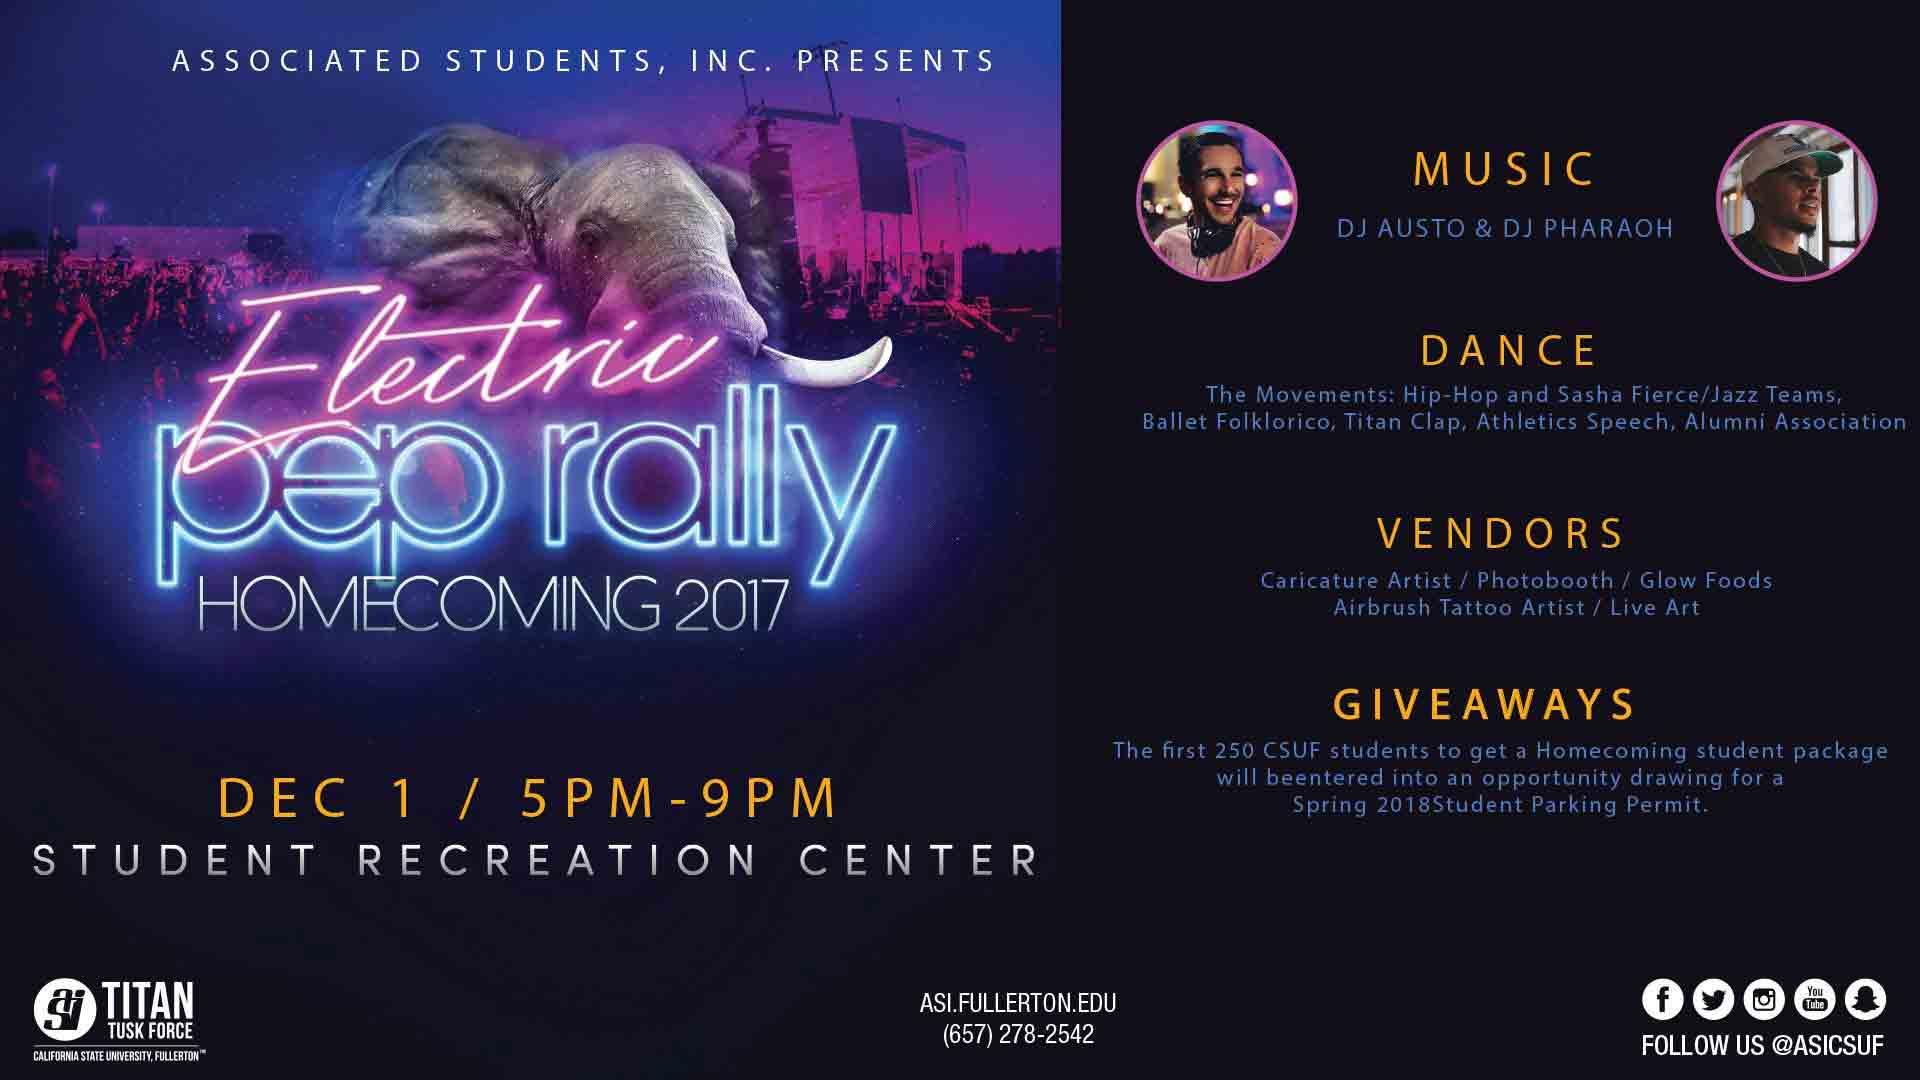 CSUF Homecoming pep rally promises students EDC vibes 1920x1080